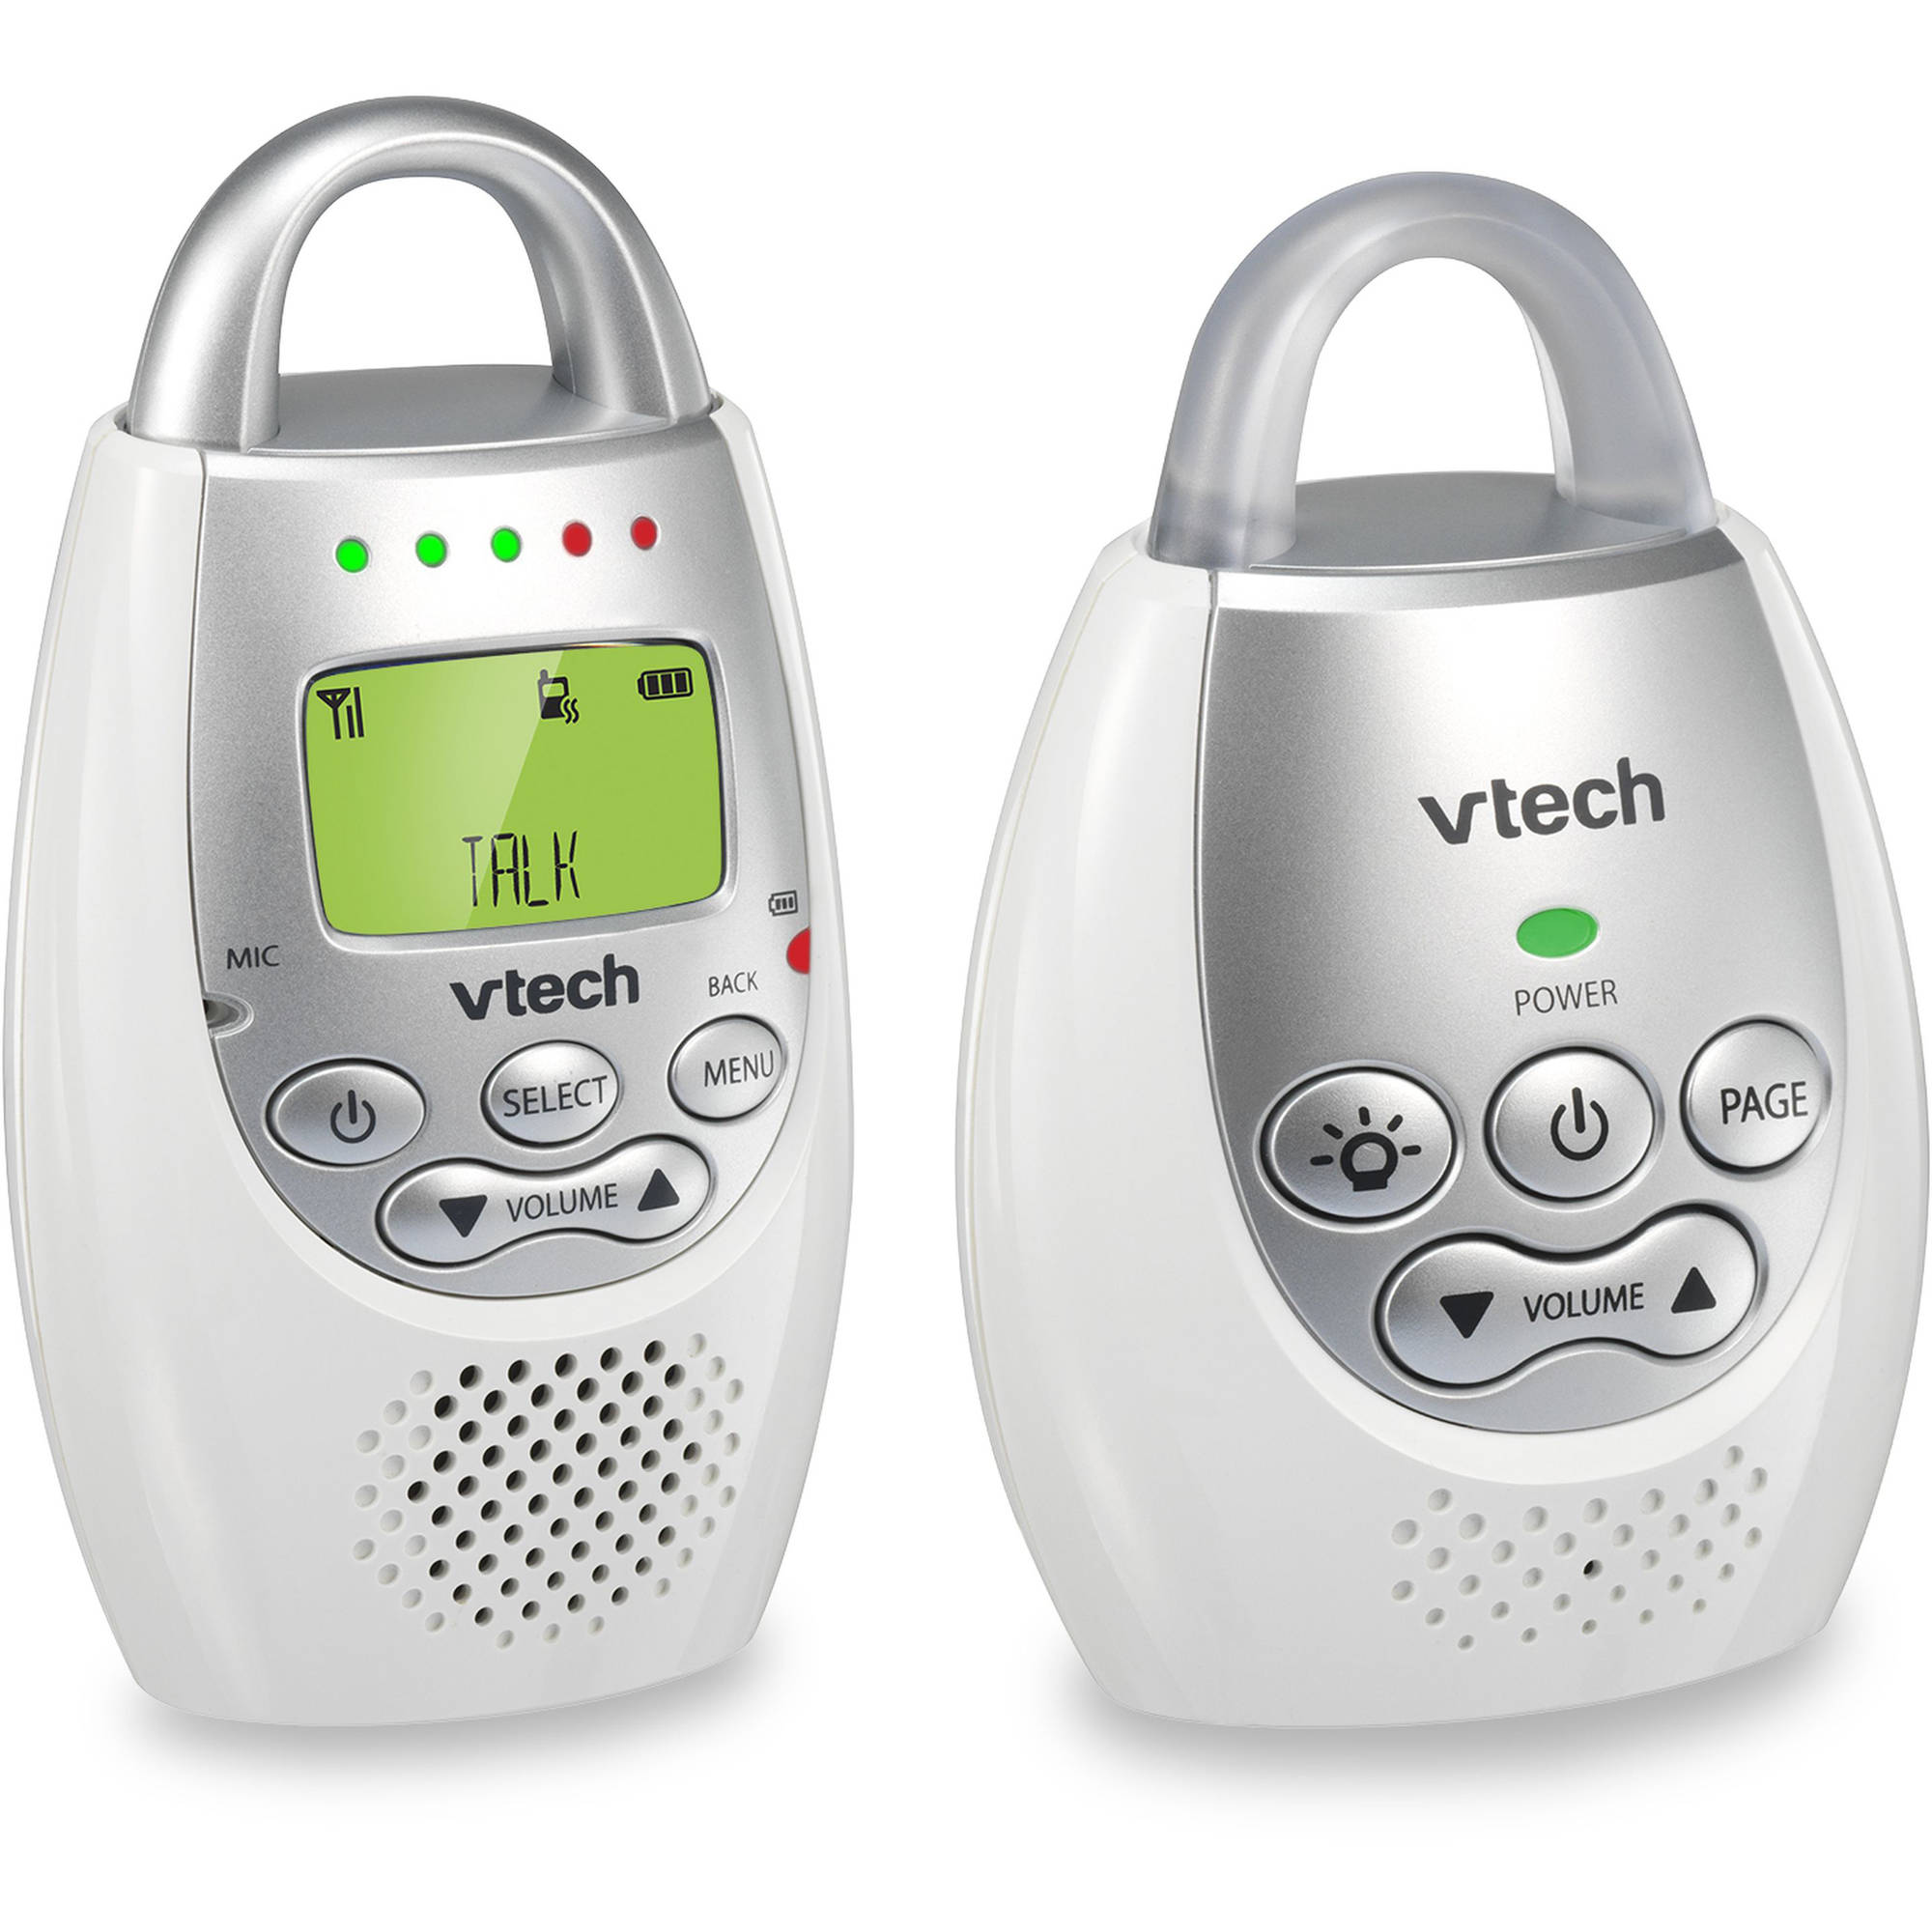 VTech DM221 Safe & Sound DECT 6.0 Digital Audio Baby Monitor with Vibrating Sound Alert, 1 Parent Unit, White/Silver